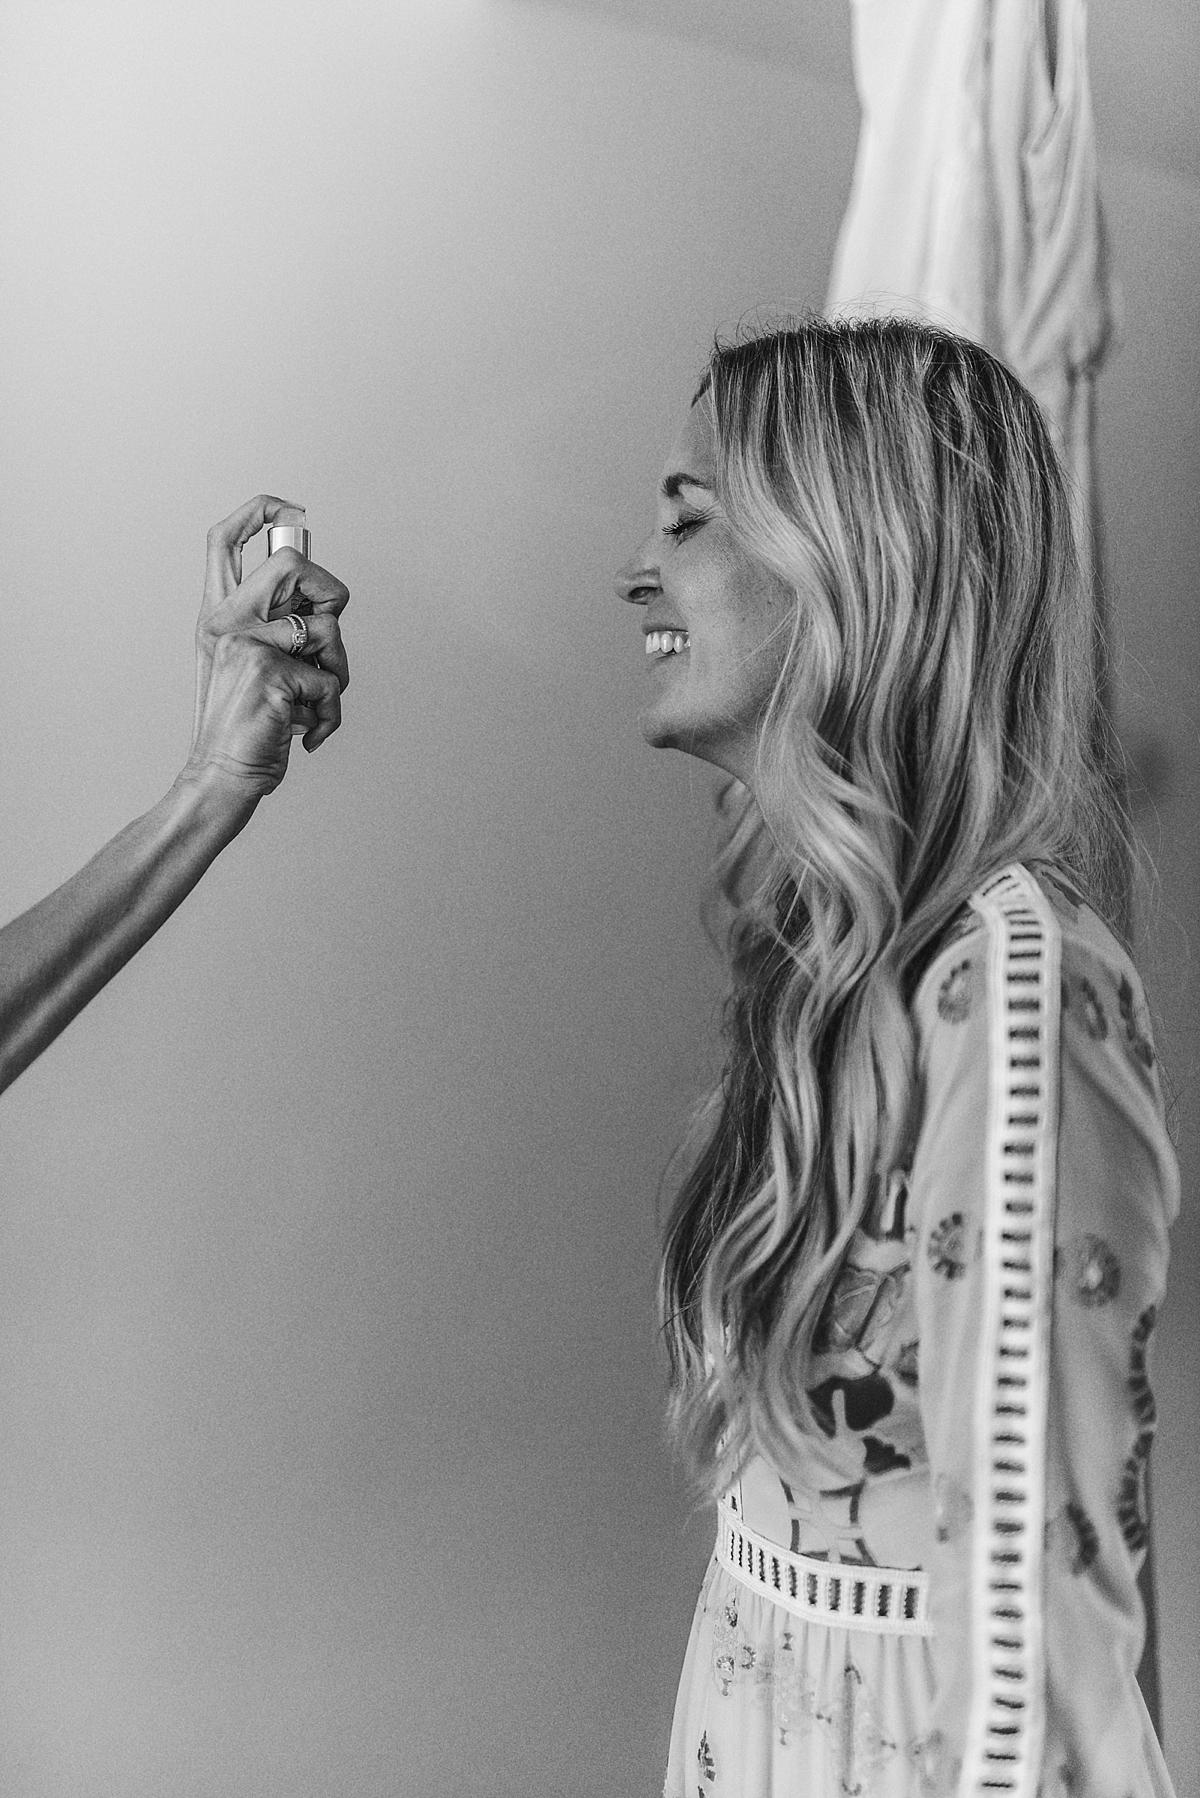 hochzeitsfotograf-formentera-ibiza hochzeitsfotograf formentera ibiza boho weddingLaura & Alex Bohemian Wedding Formenterahochzeitsfotograf formentera ibiza boho 1872